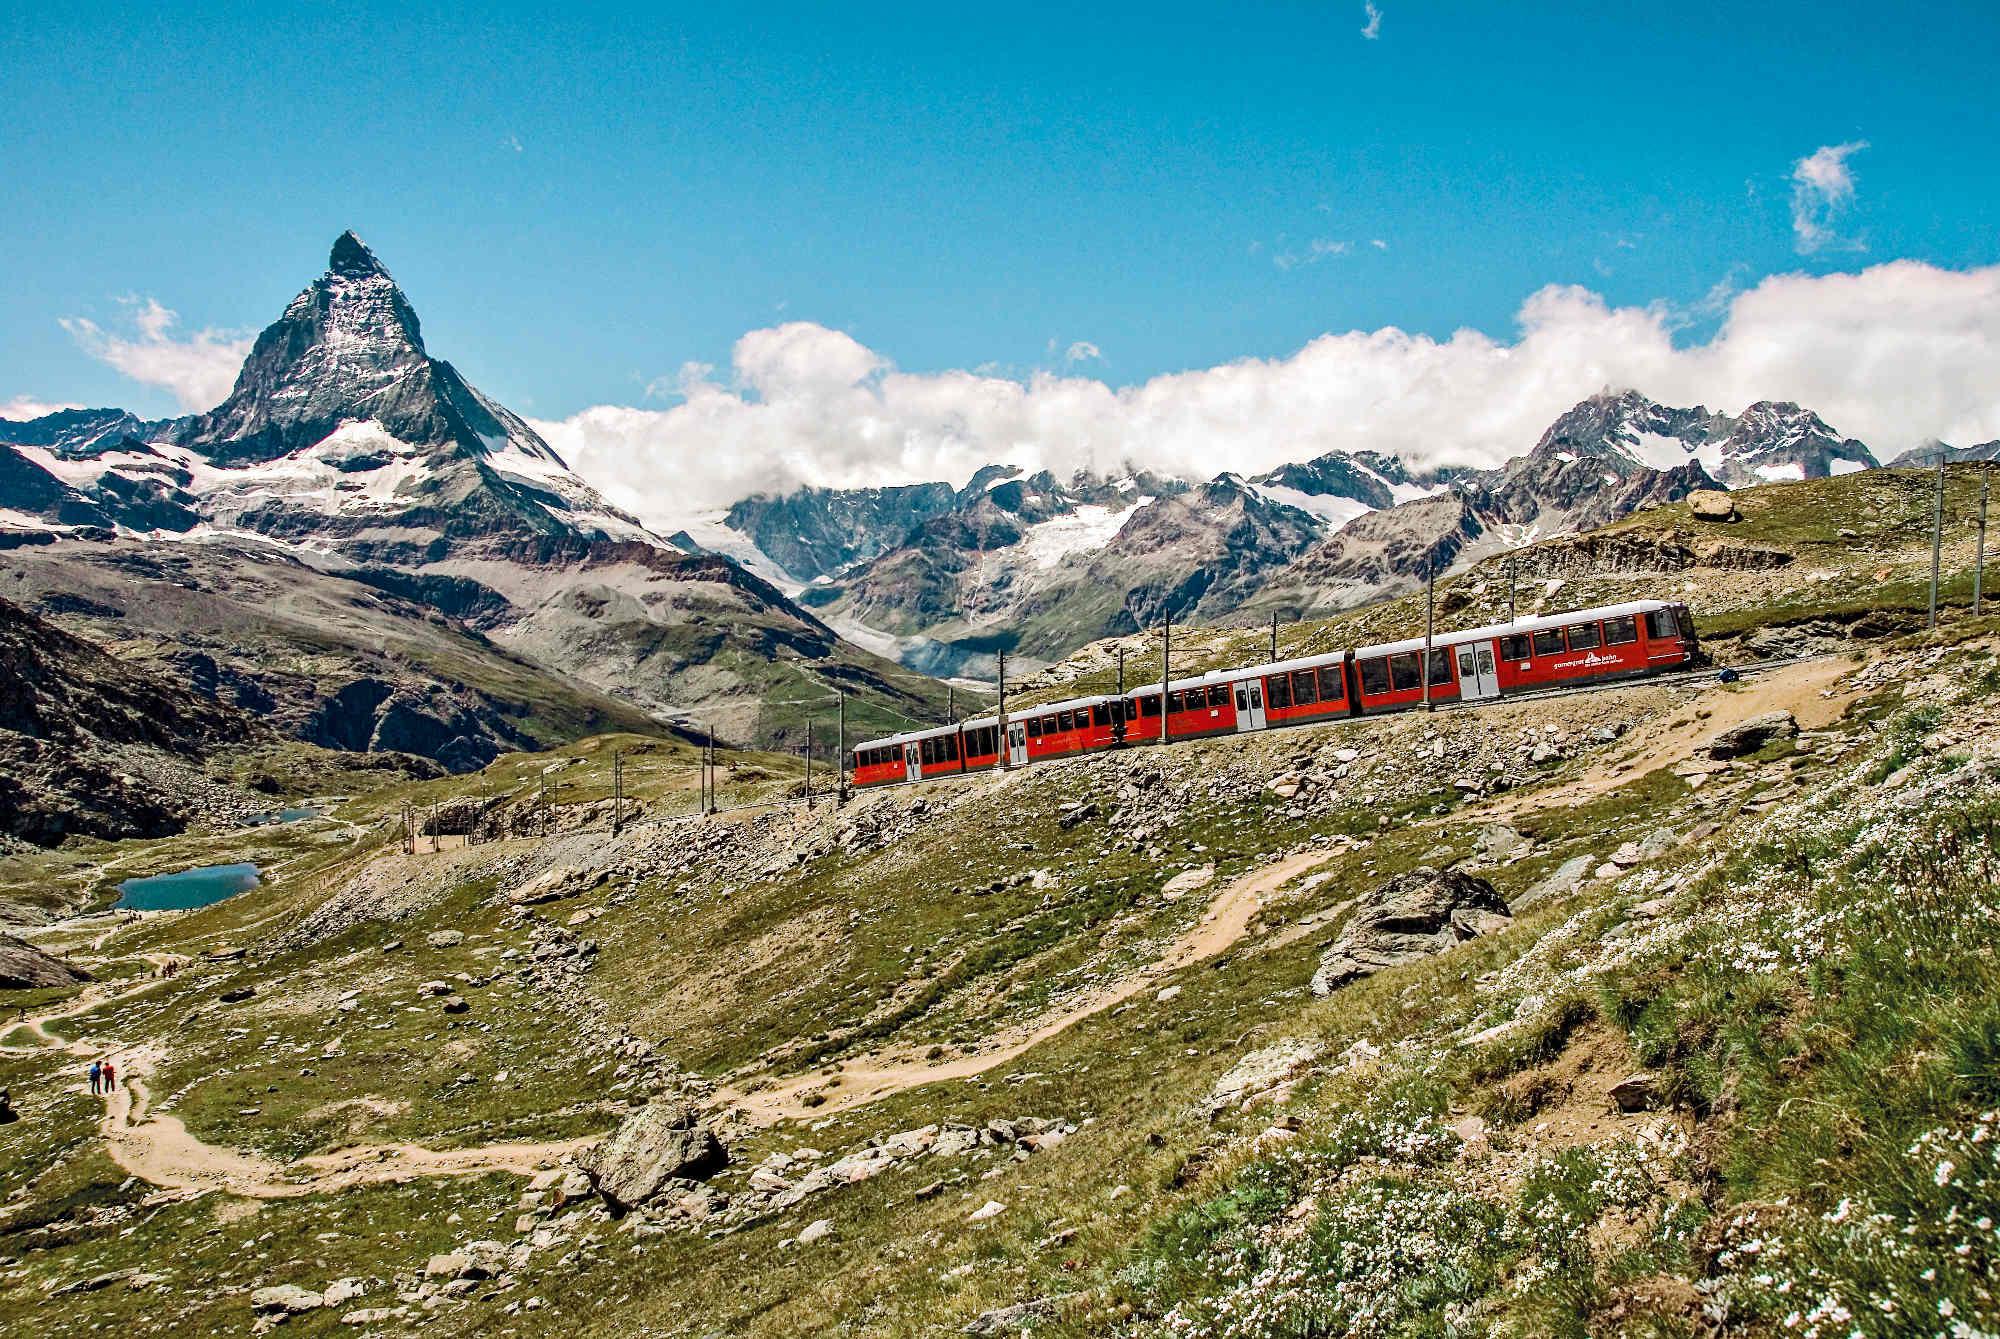 Schweiz, Gornergratbahn, Zermatt